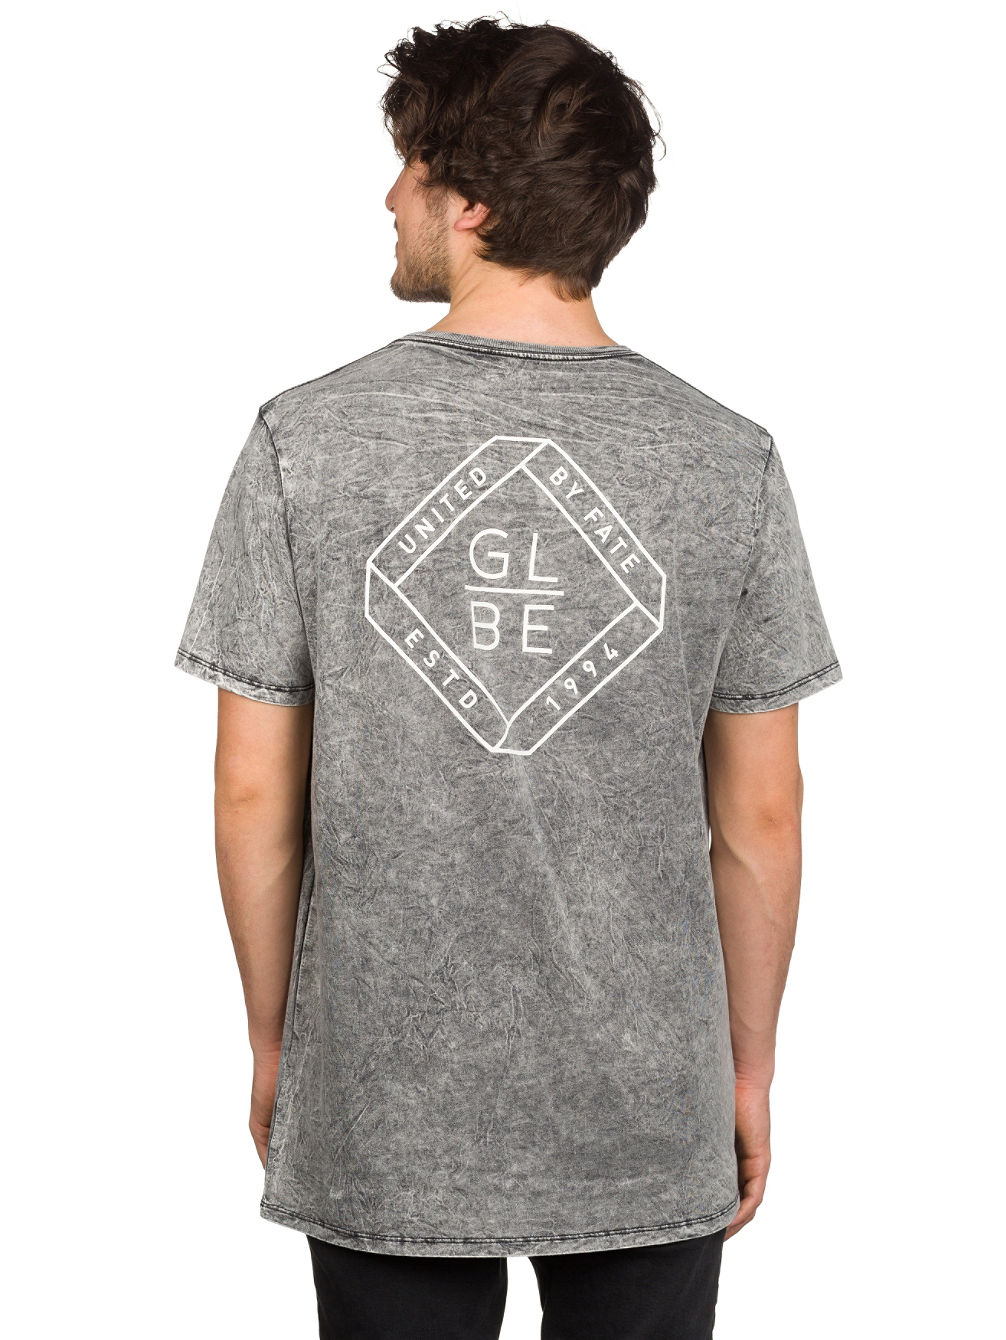 globe-smiths-t-shirt